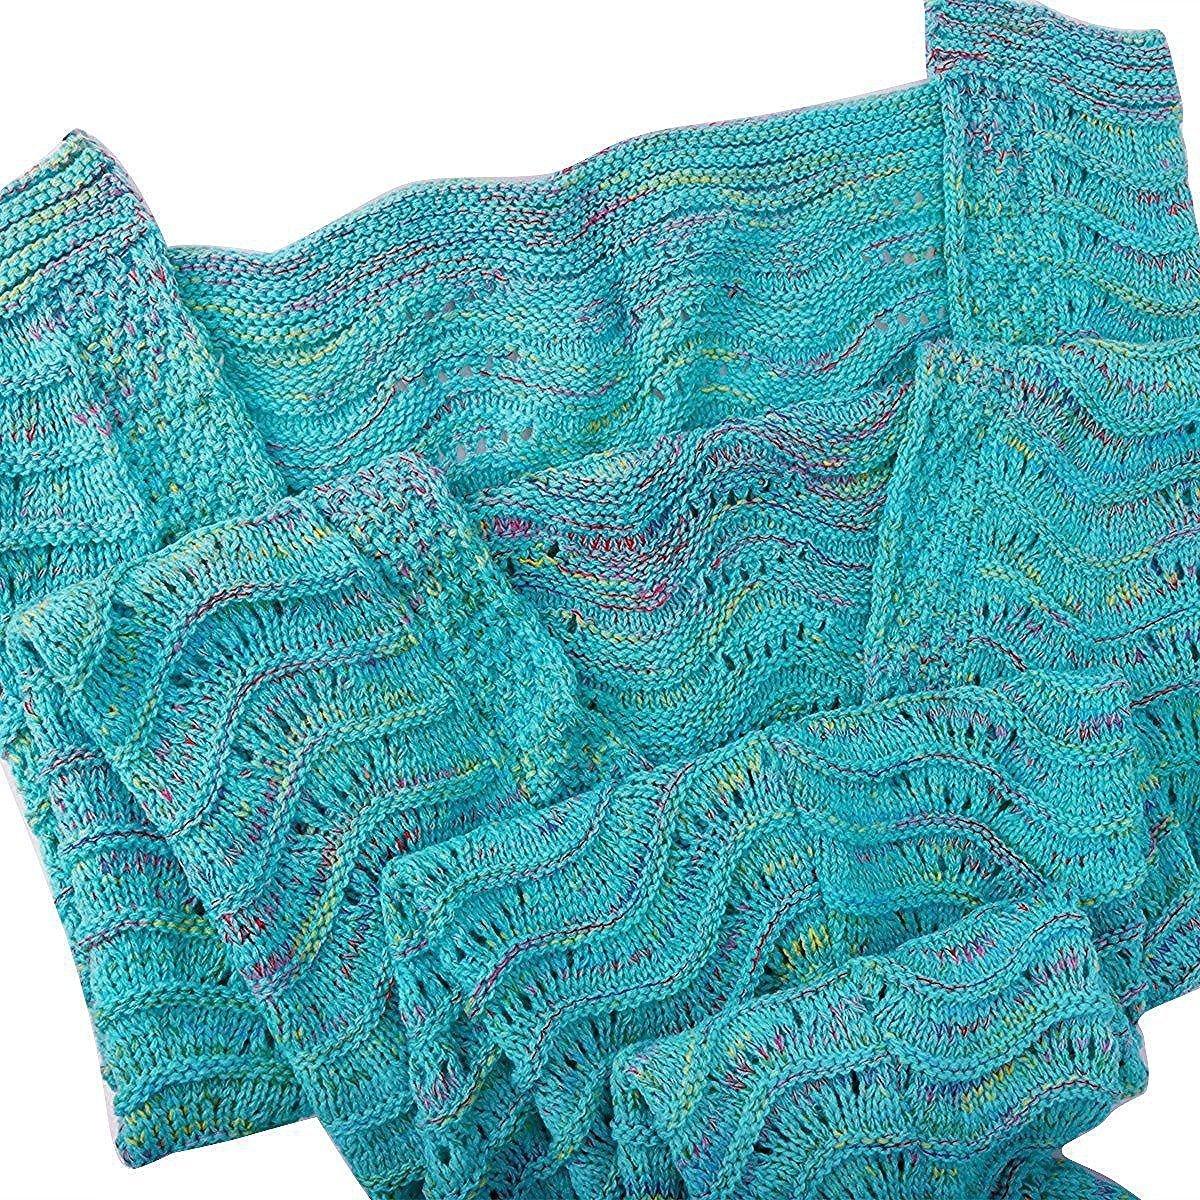 Fu Store Mermaid Tail Blanket Crochet Mermaid Blanket for Adult, Super Soft All Seasons Sofa Sleeping Blanket, Cool Birthday Wedding Christmas, 71 x 35 Inches, Mint Green by Fu Store (Image #4)